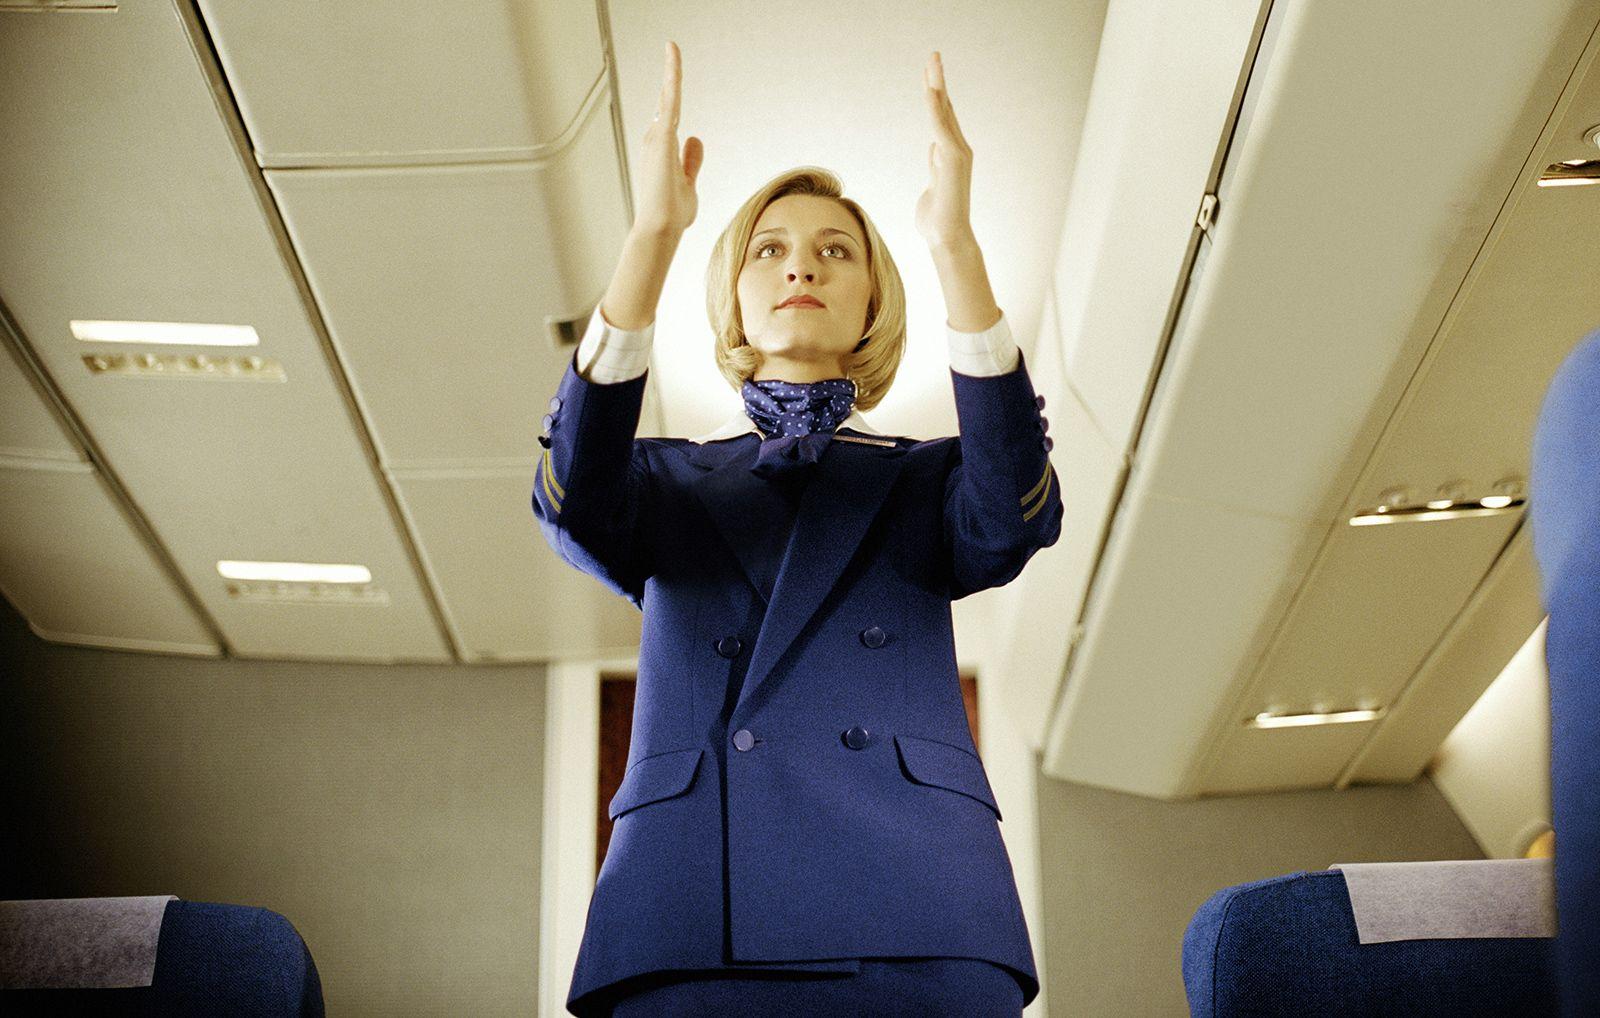 Craziest flight attendant stories